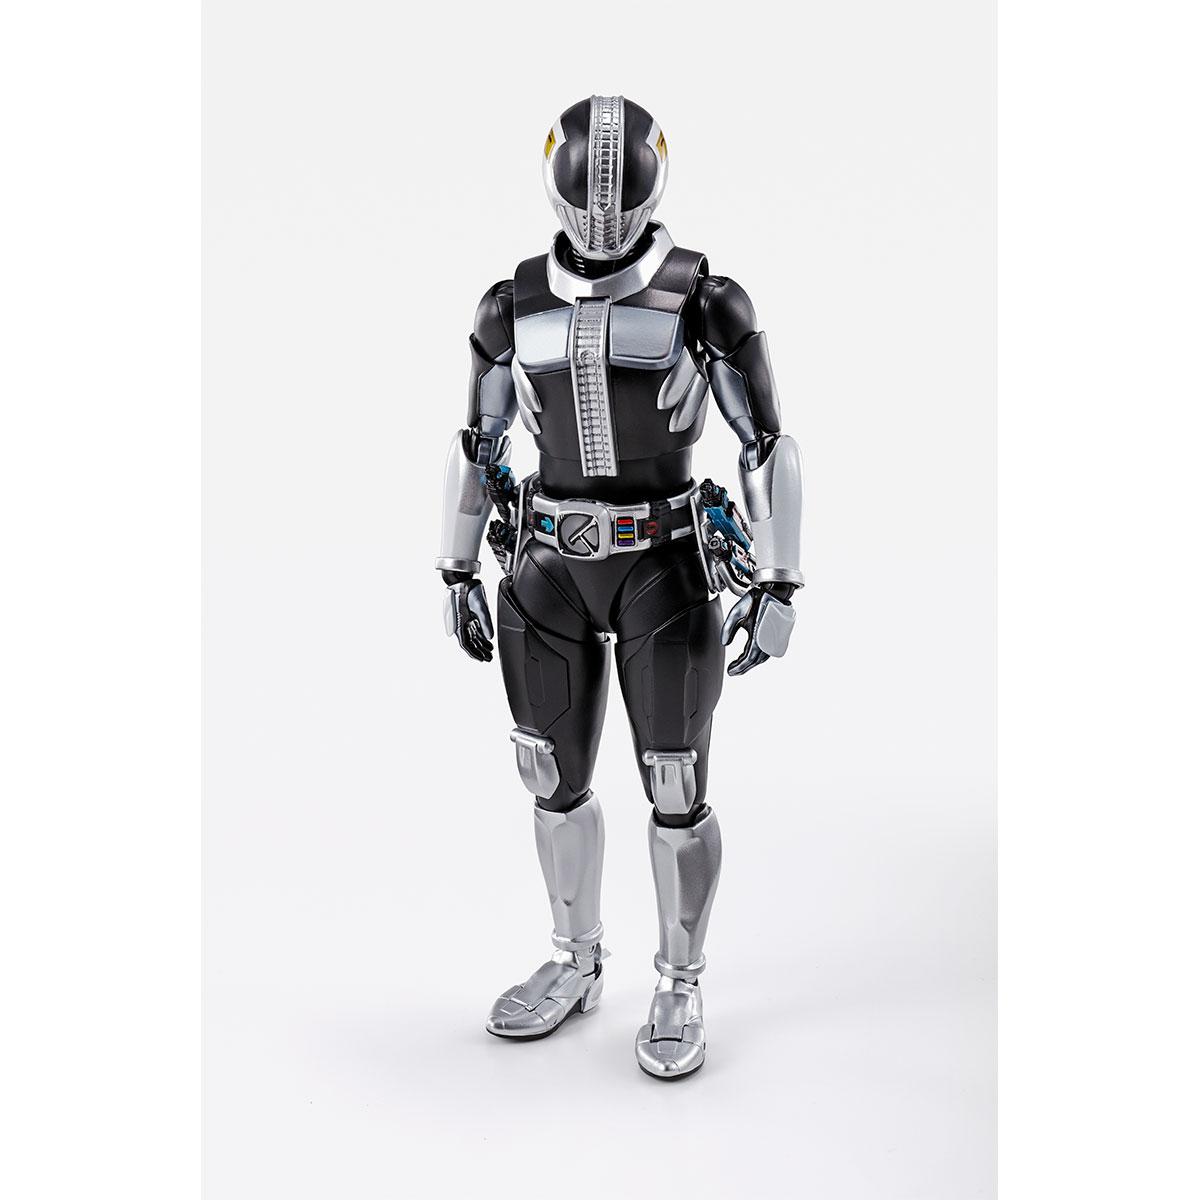 S.H.Figuarts Shinkocchou Seihou Kamen Rider Den-O Plat Form figure